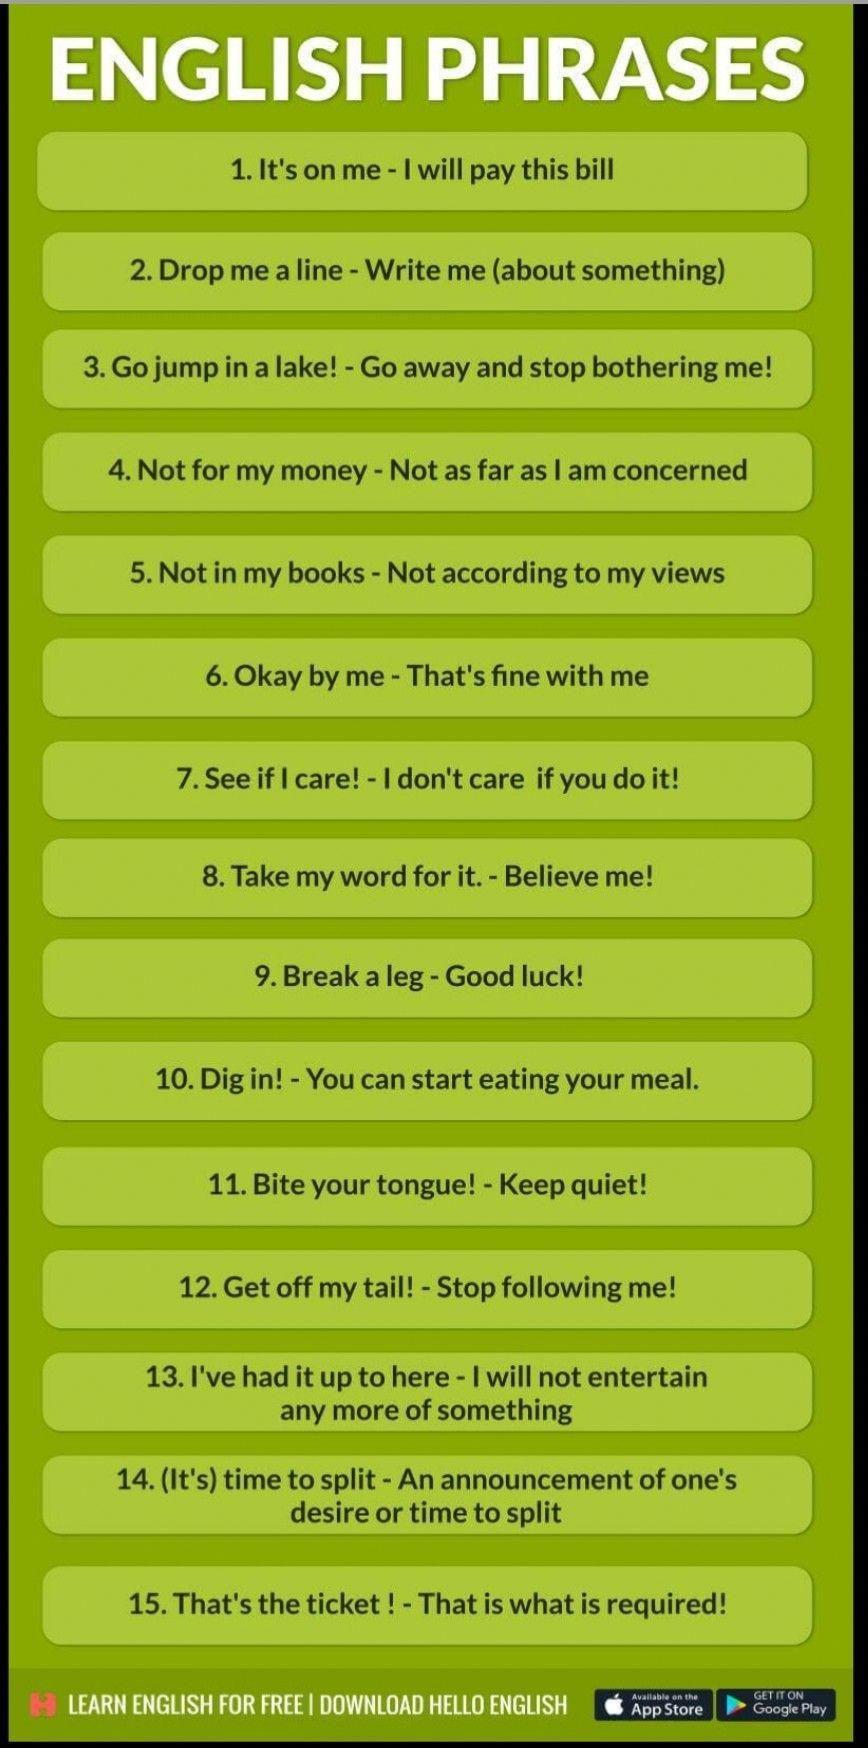 Phrase Vocabulaireanglais Palabras De Vocabulario Como Aprender Ingles Basico Vocabulario En Ingles